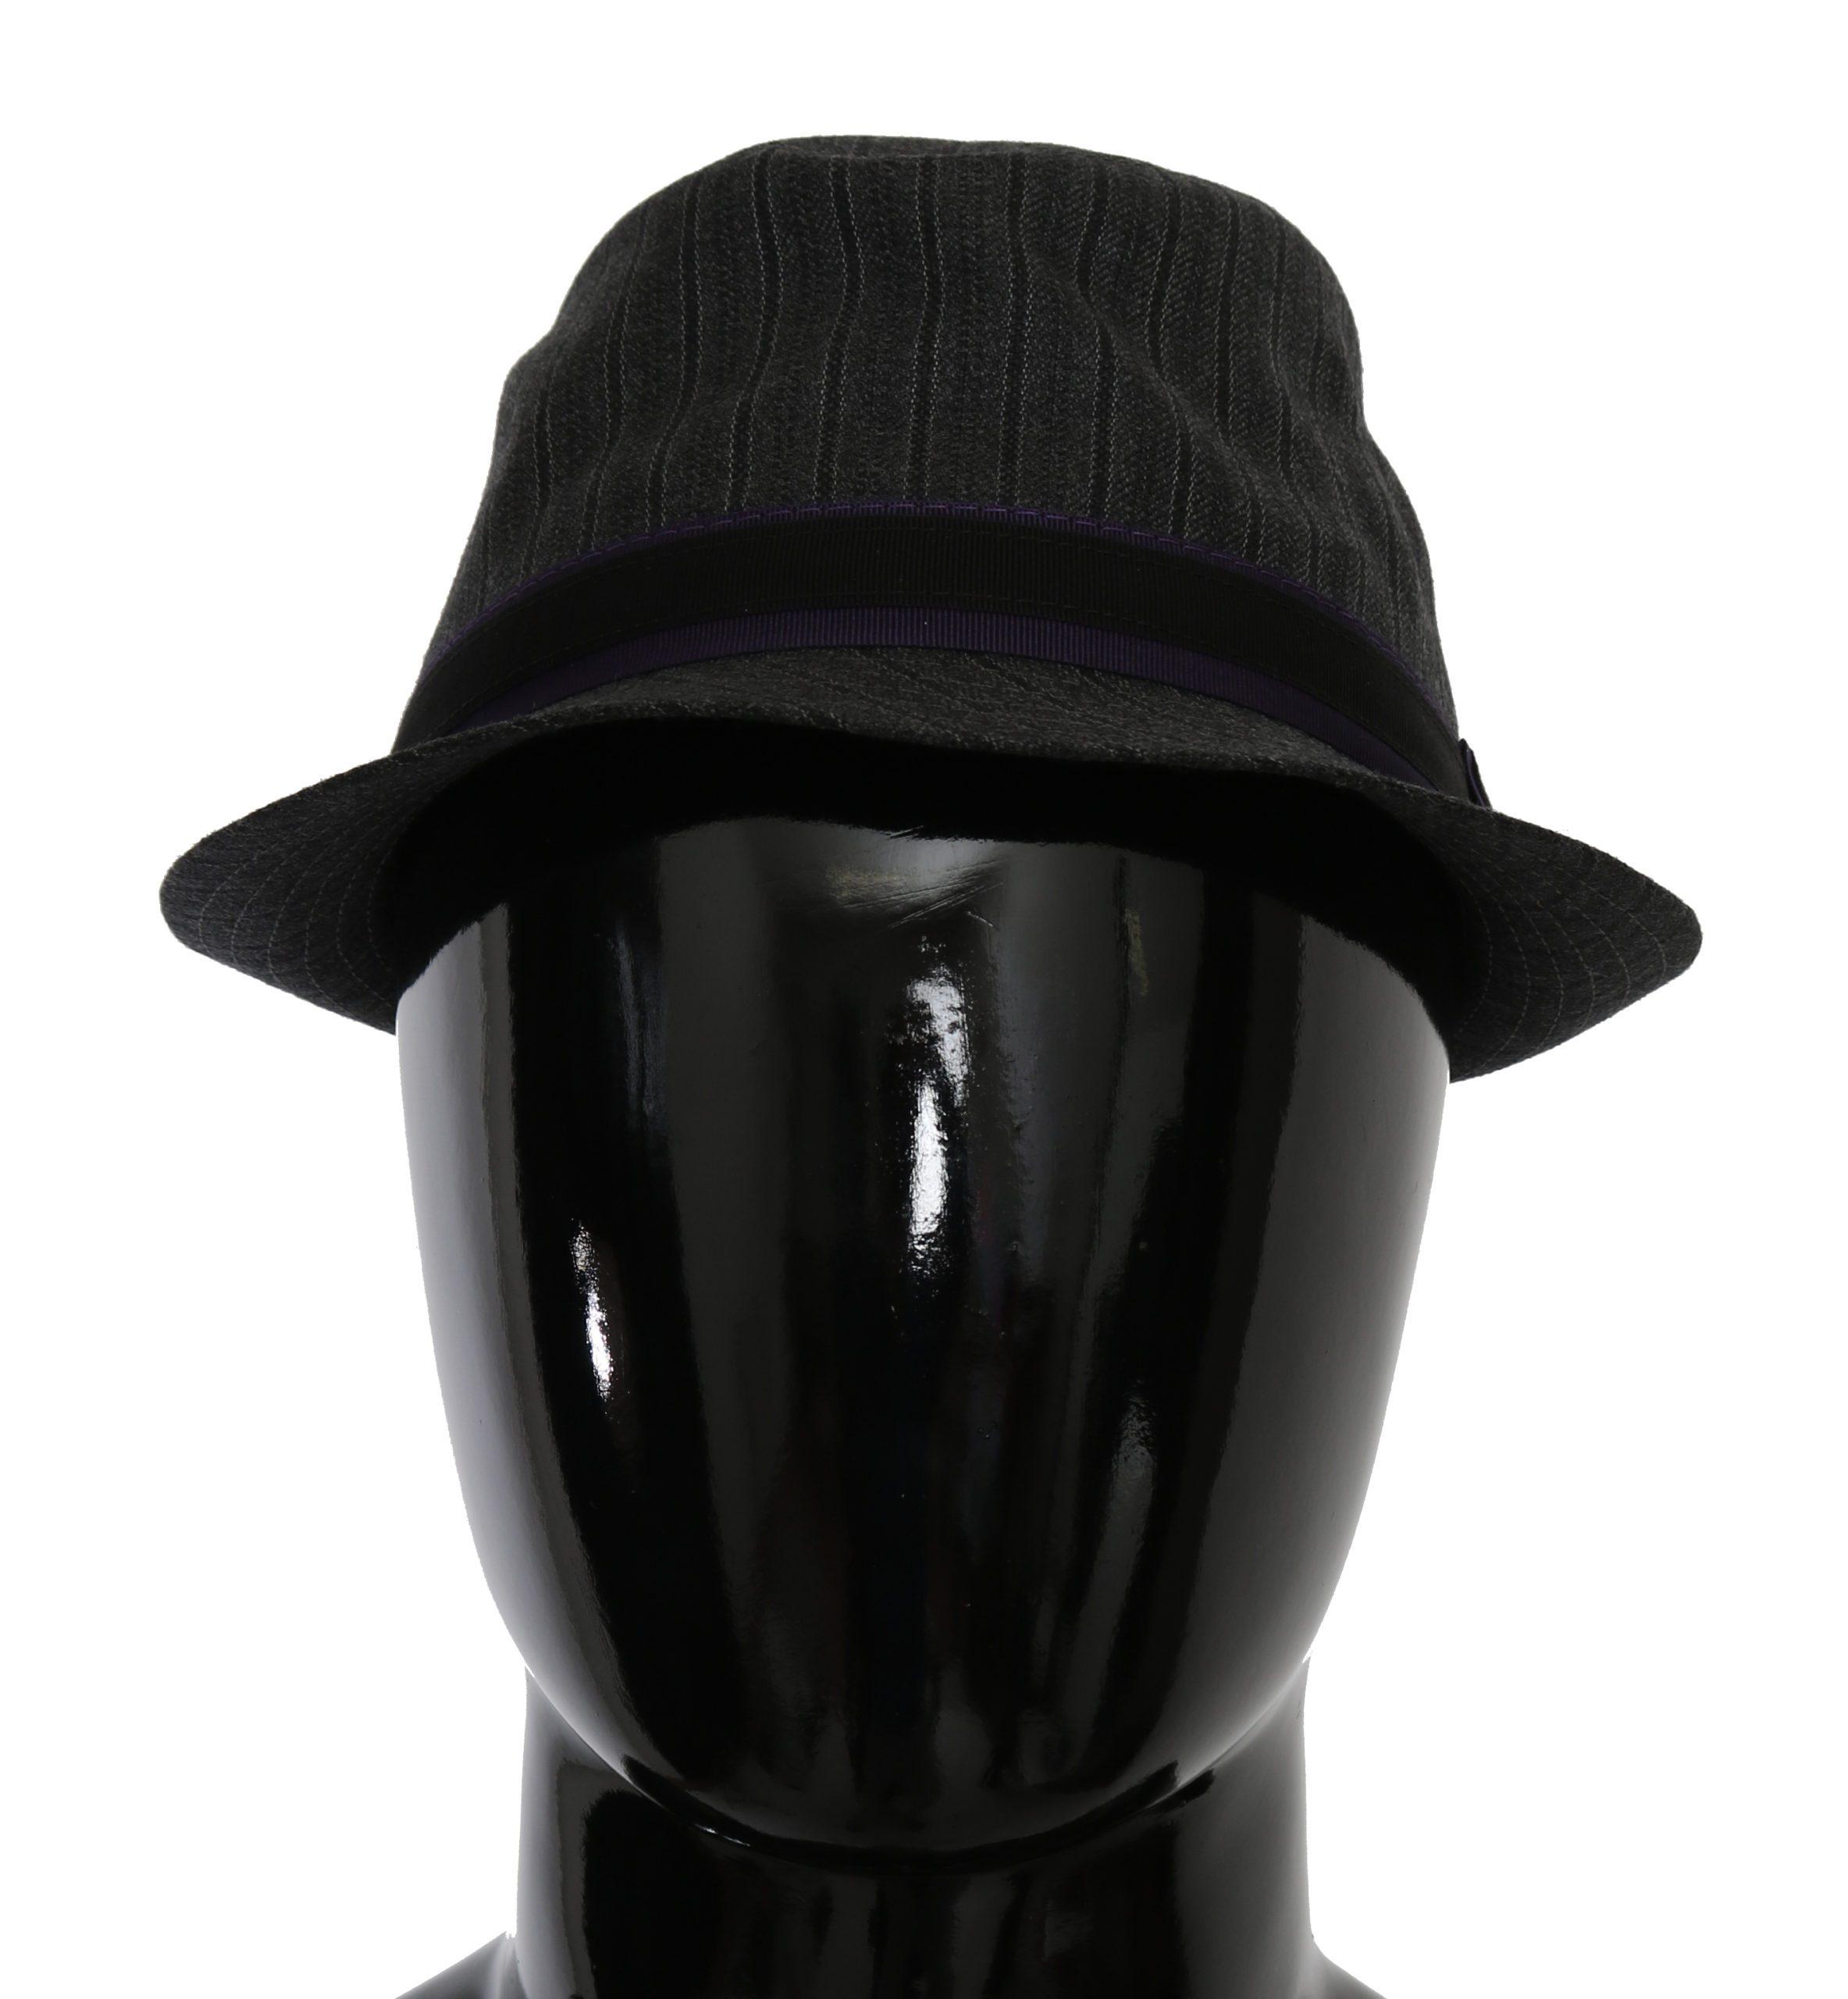 Dolce & Gabbana Men's Striped Fedora Casual Hat Gray HAT9061 - 57 cm|S